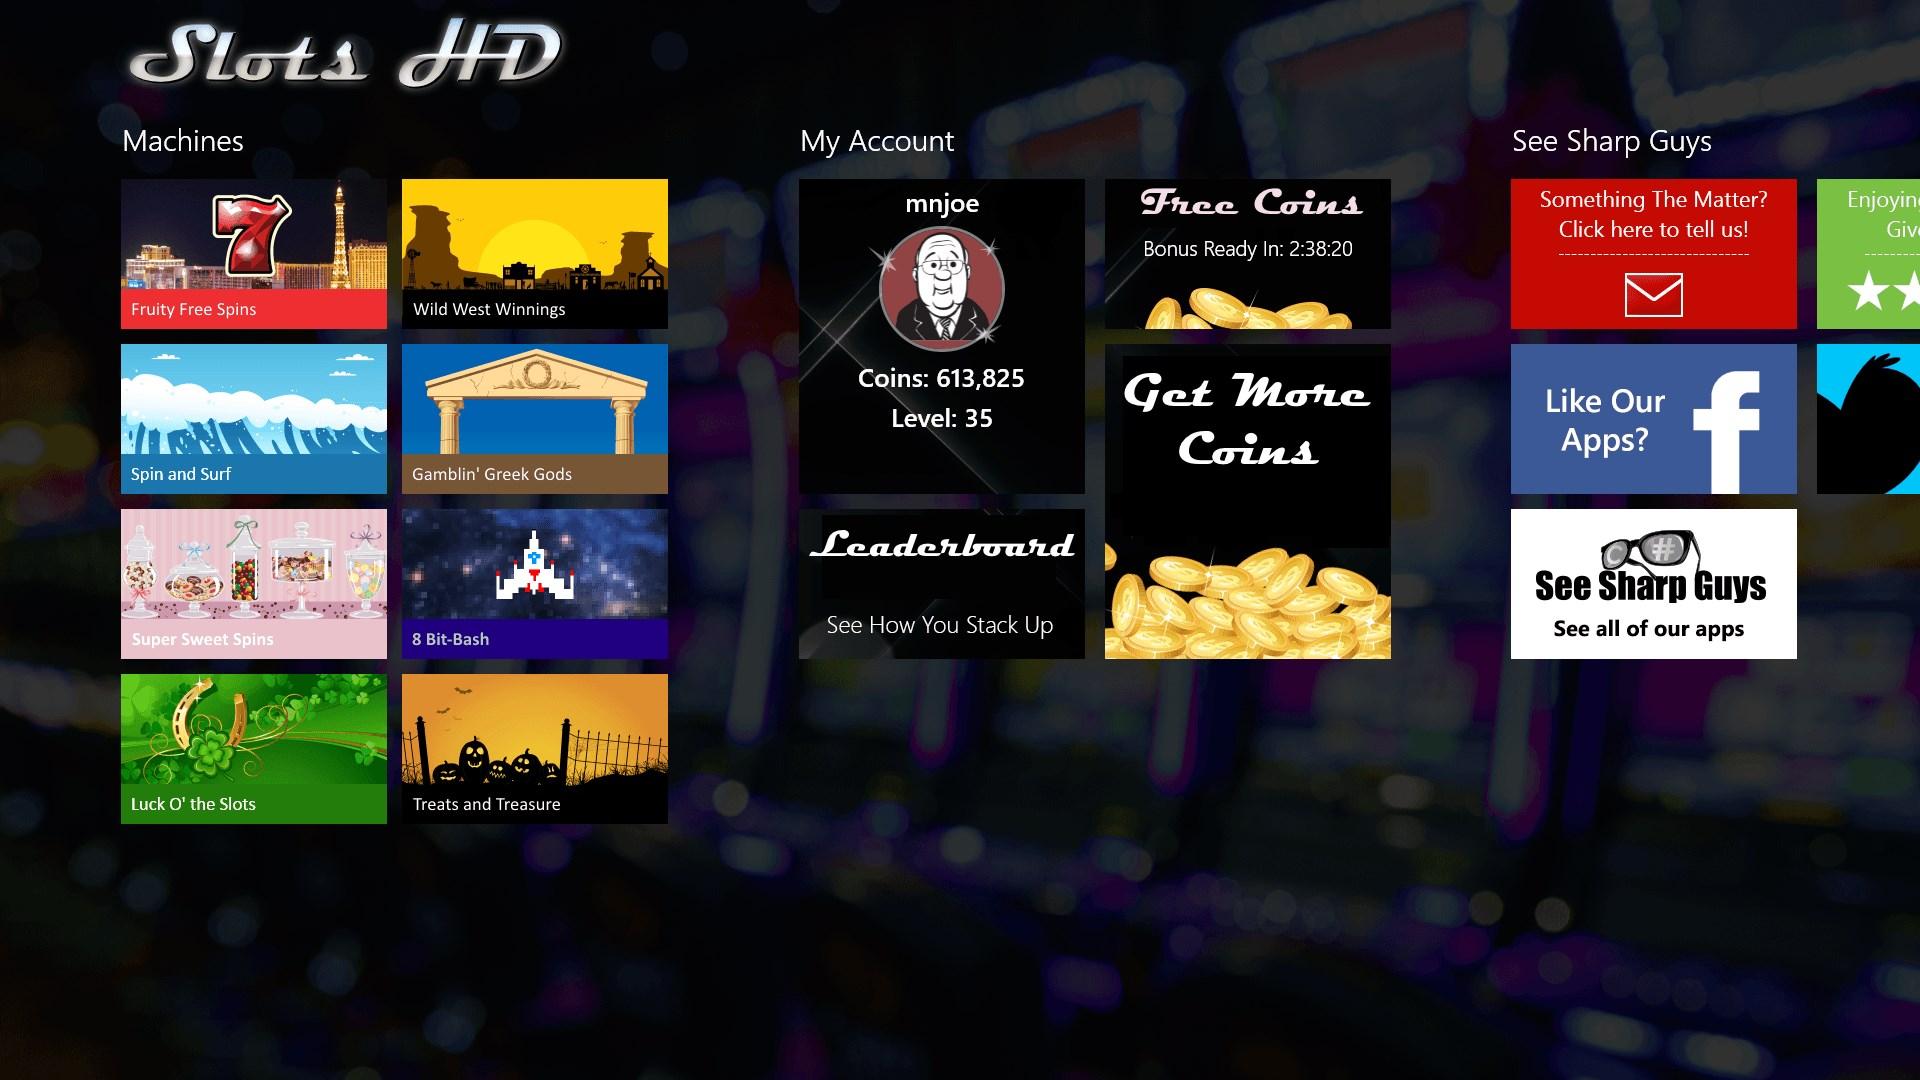 Slots HD